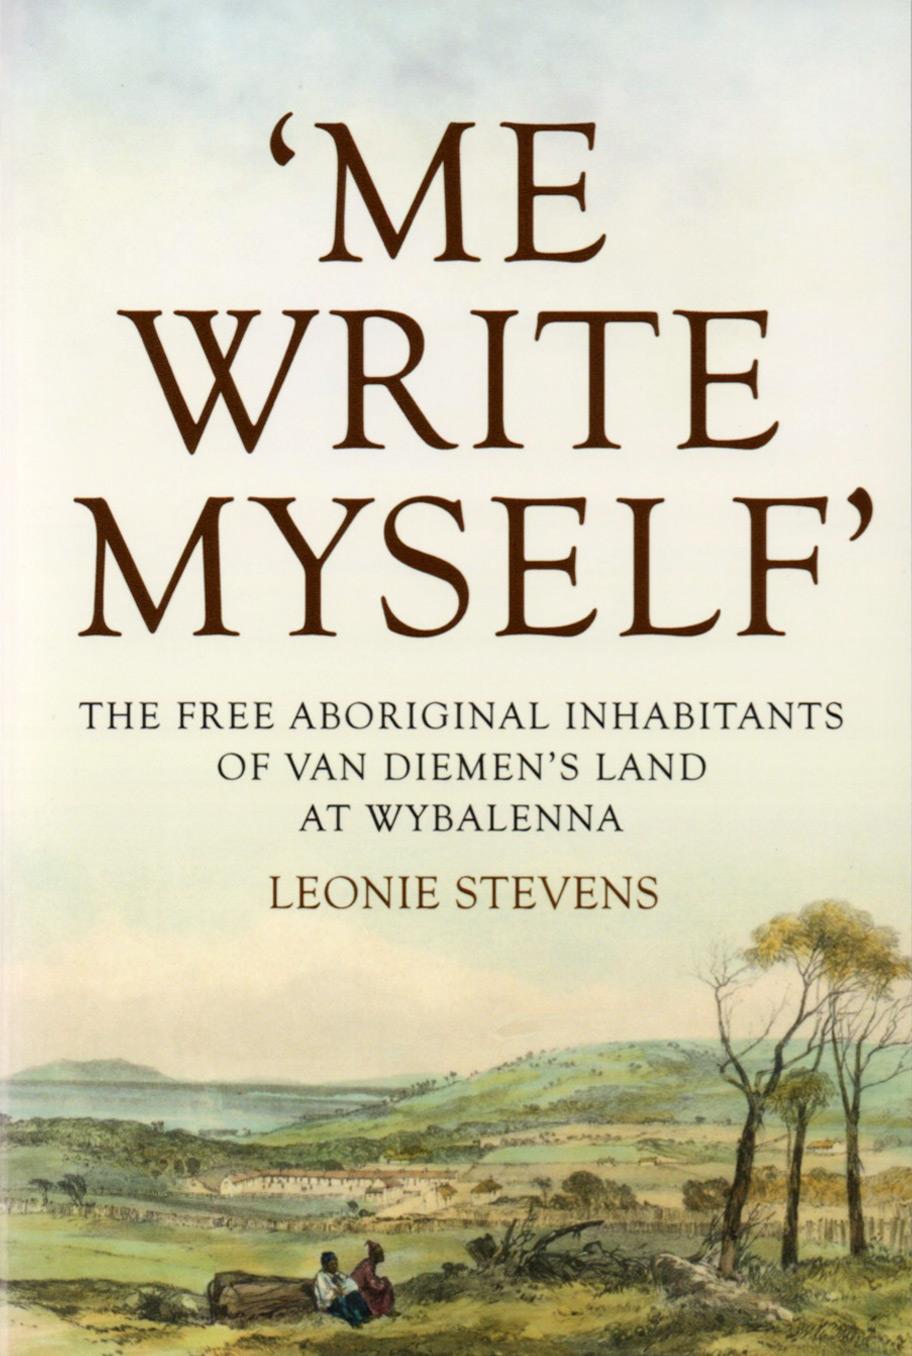 'Me Write Myself'